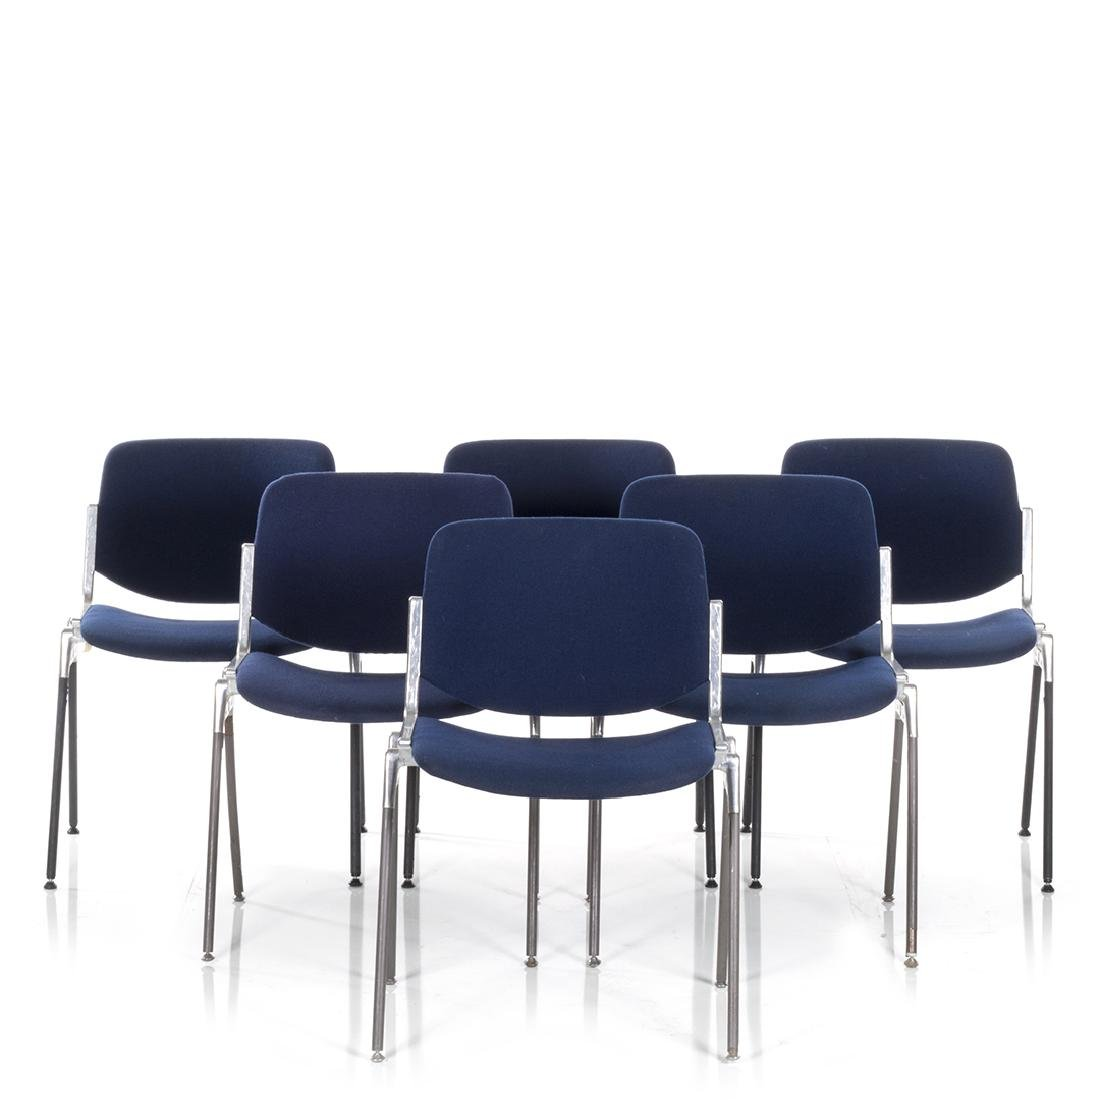 Giancarlo Piretti Chairs (12)